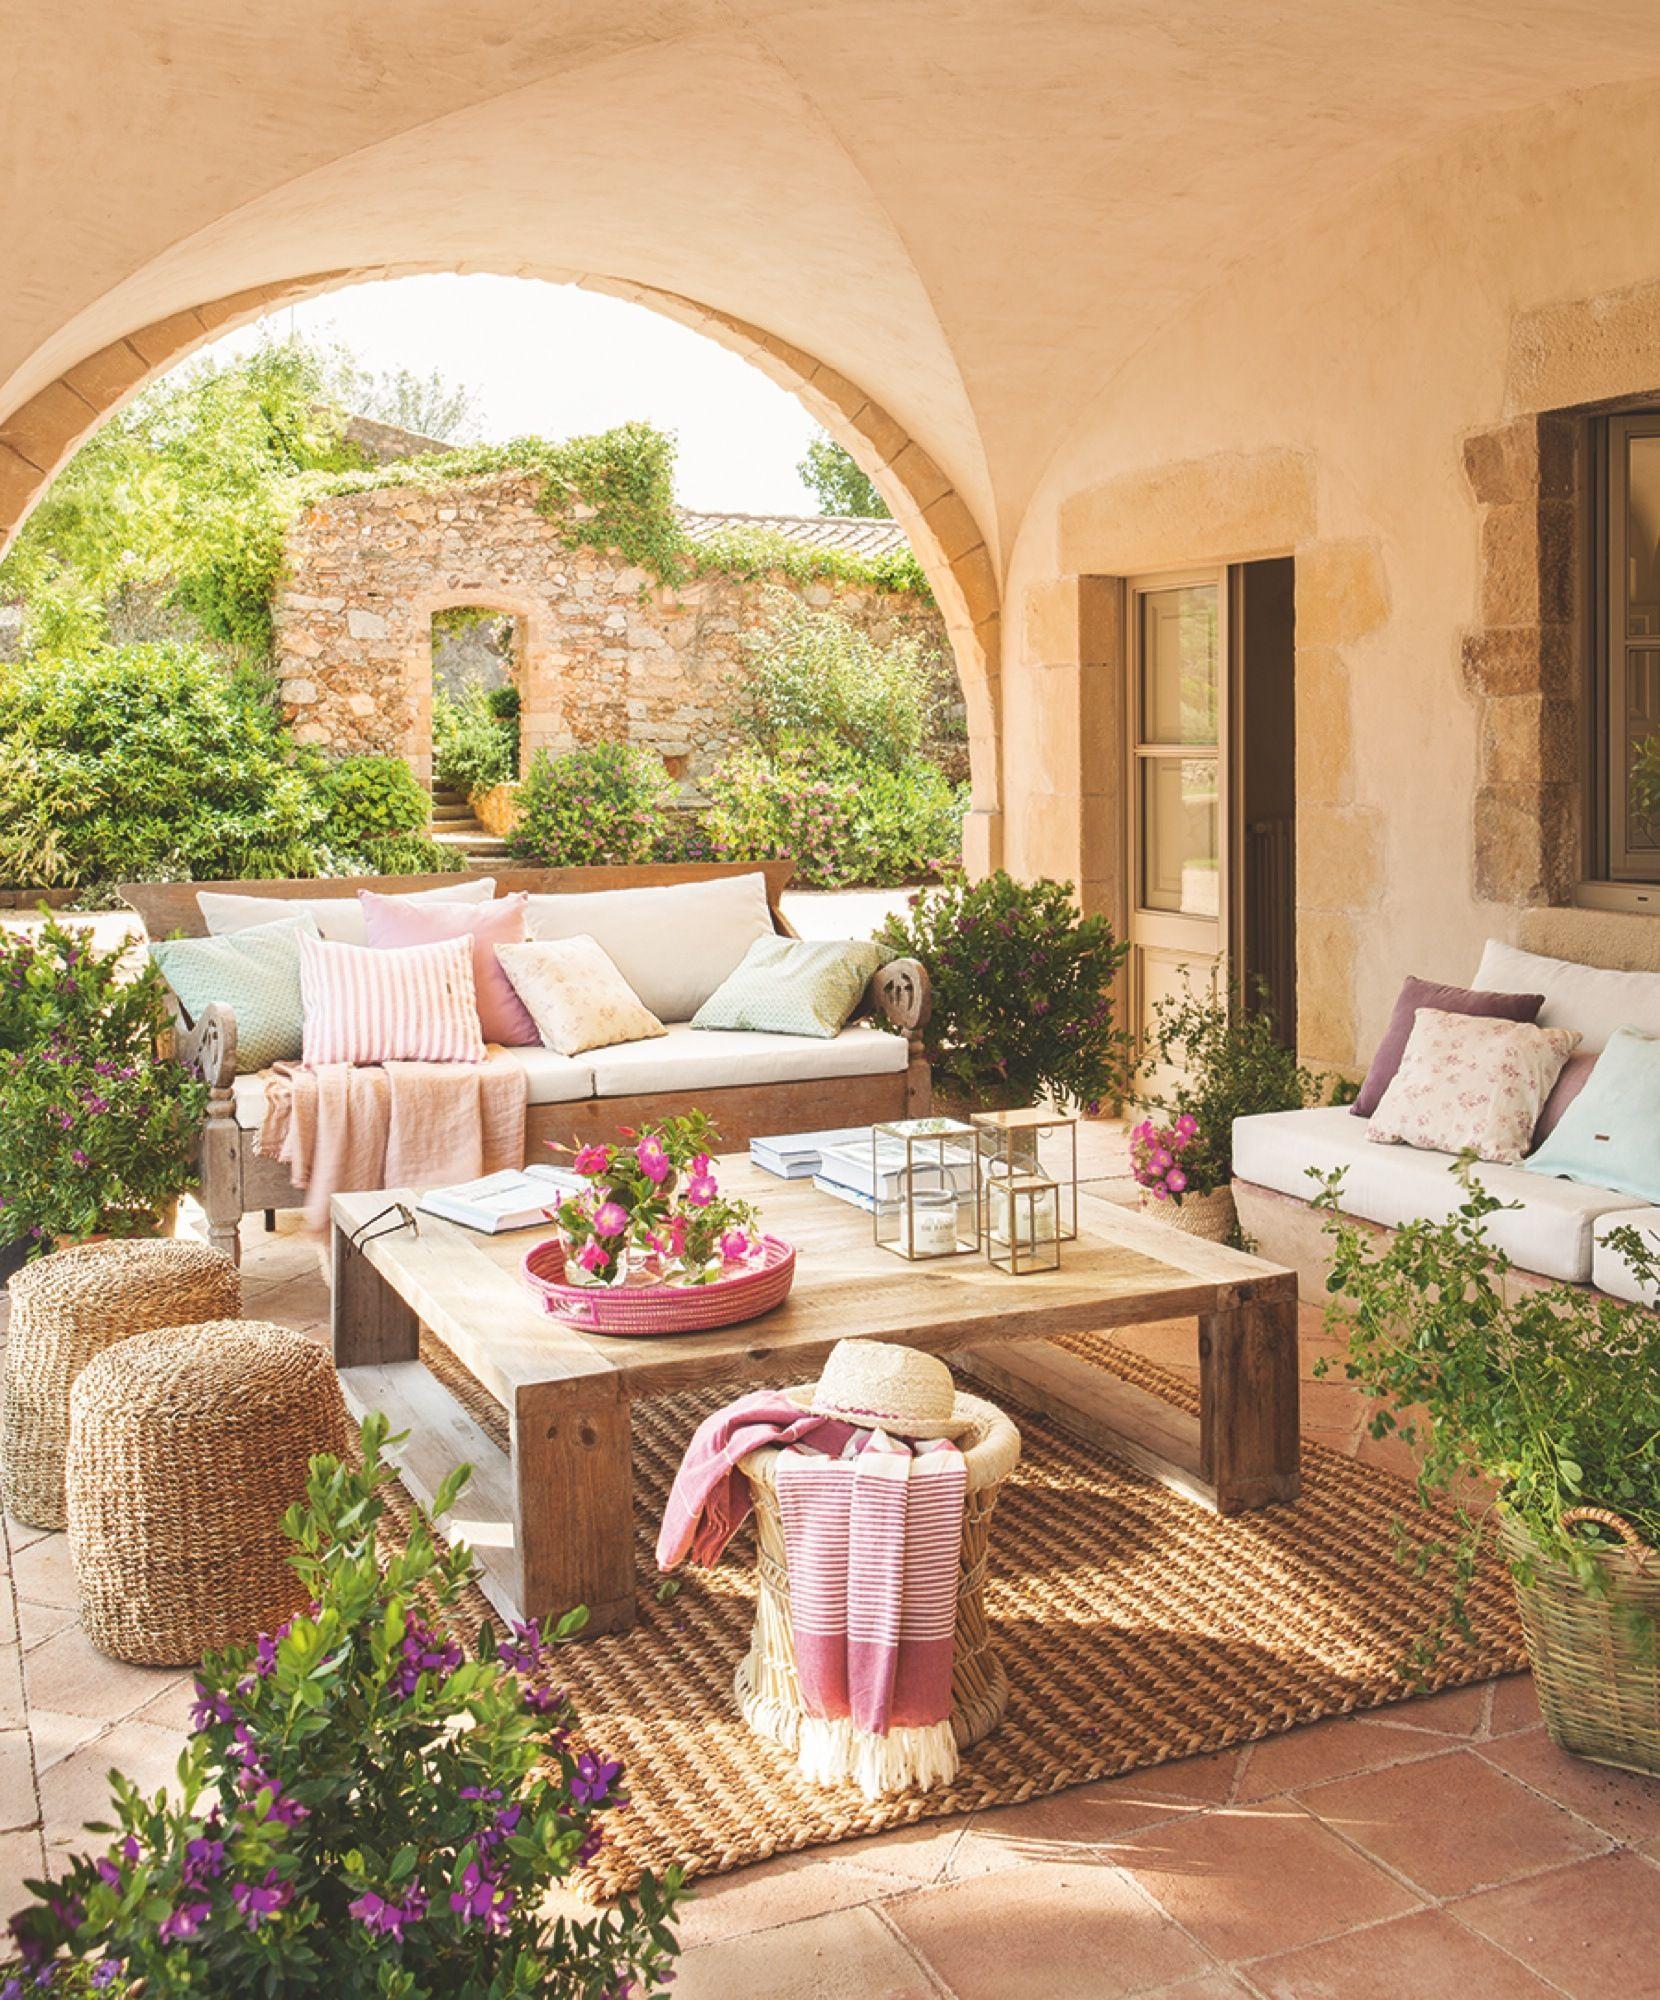 Porche con arco y salón de exterior | Dreems | Pinterest | Arco ...